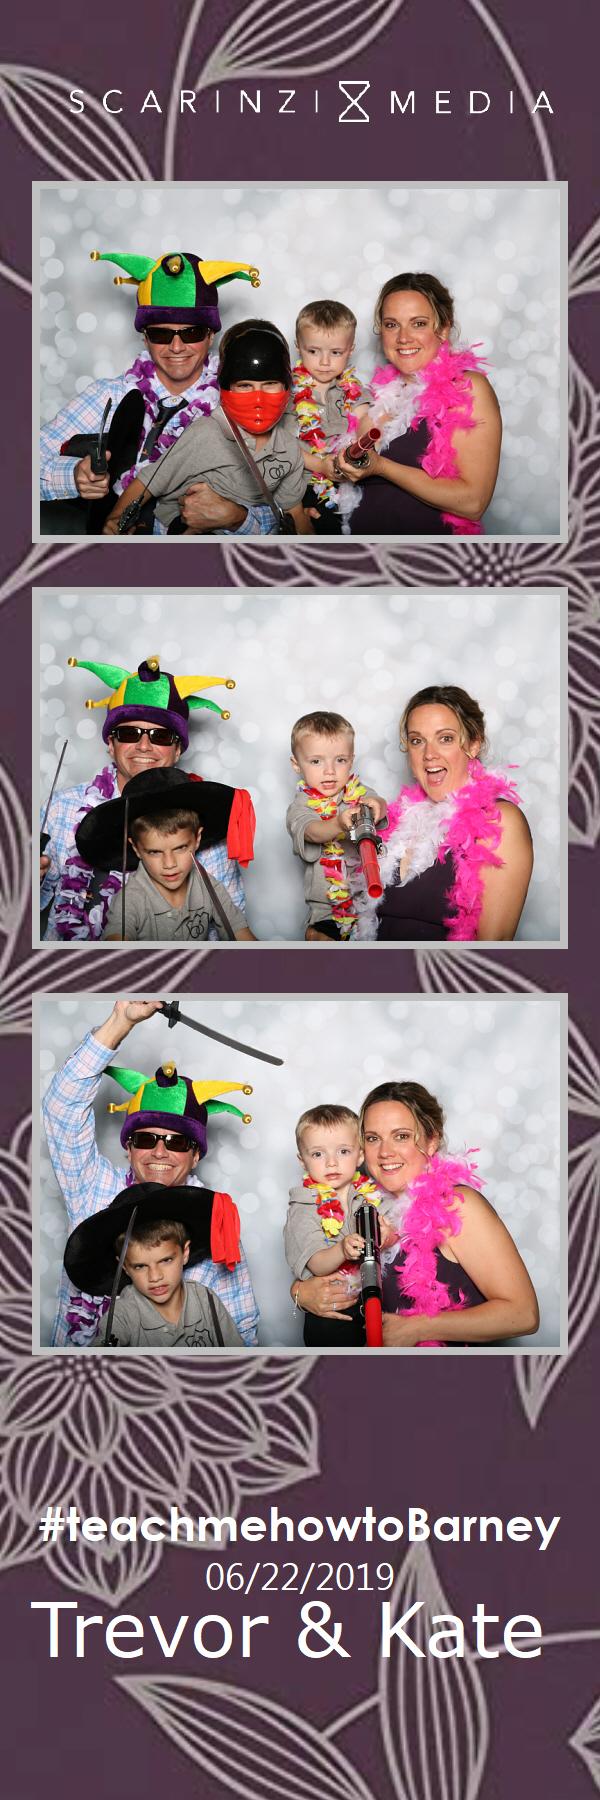 2019.06.22 - Barney Wedding PHOTOBOOTH30.jpg